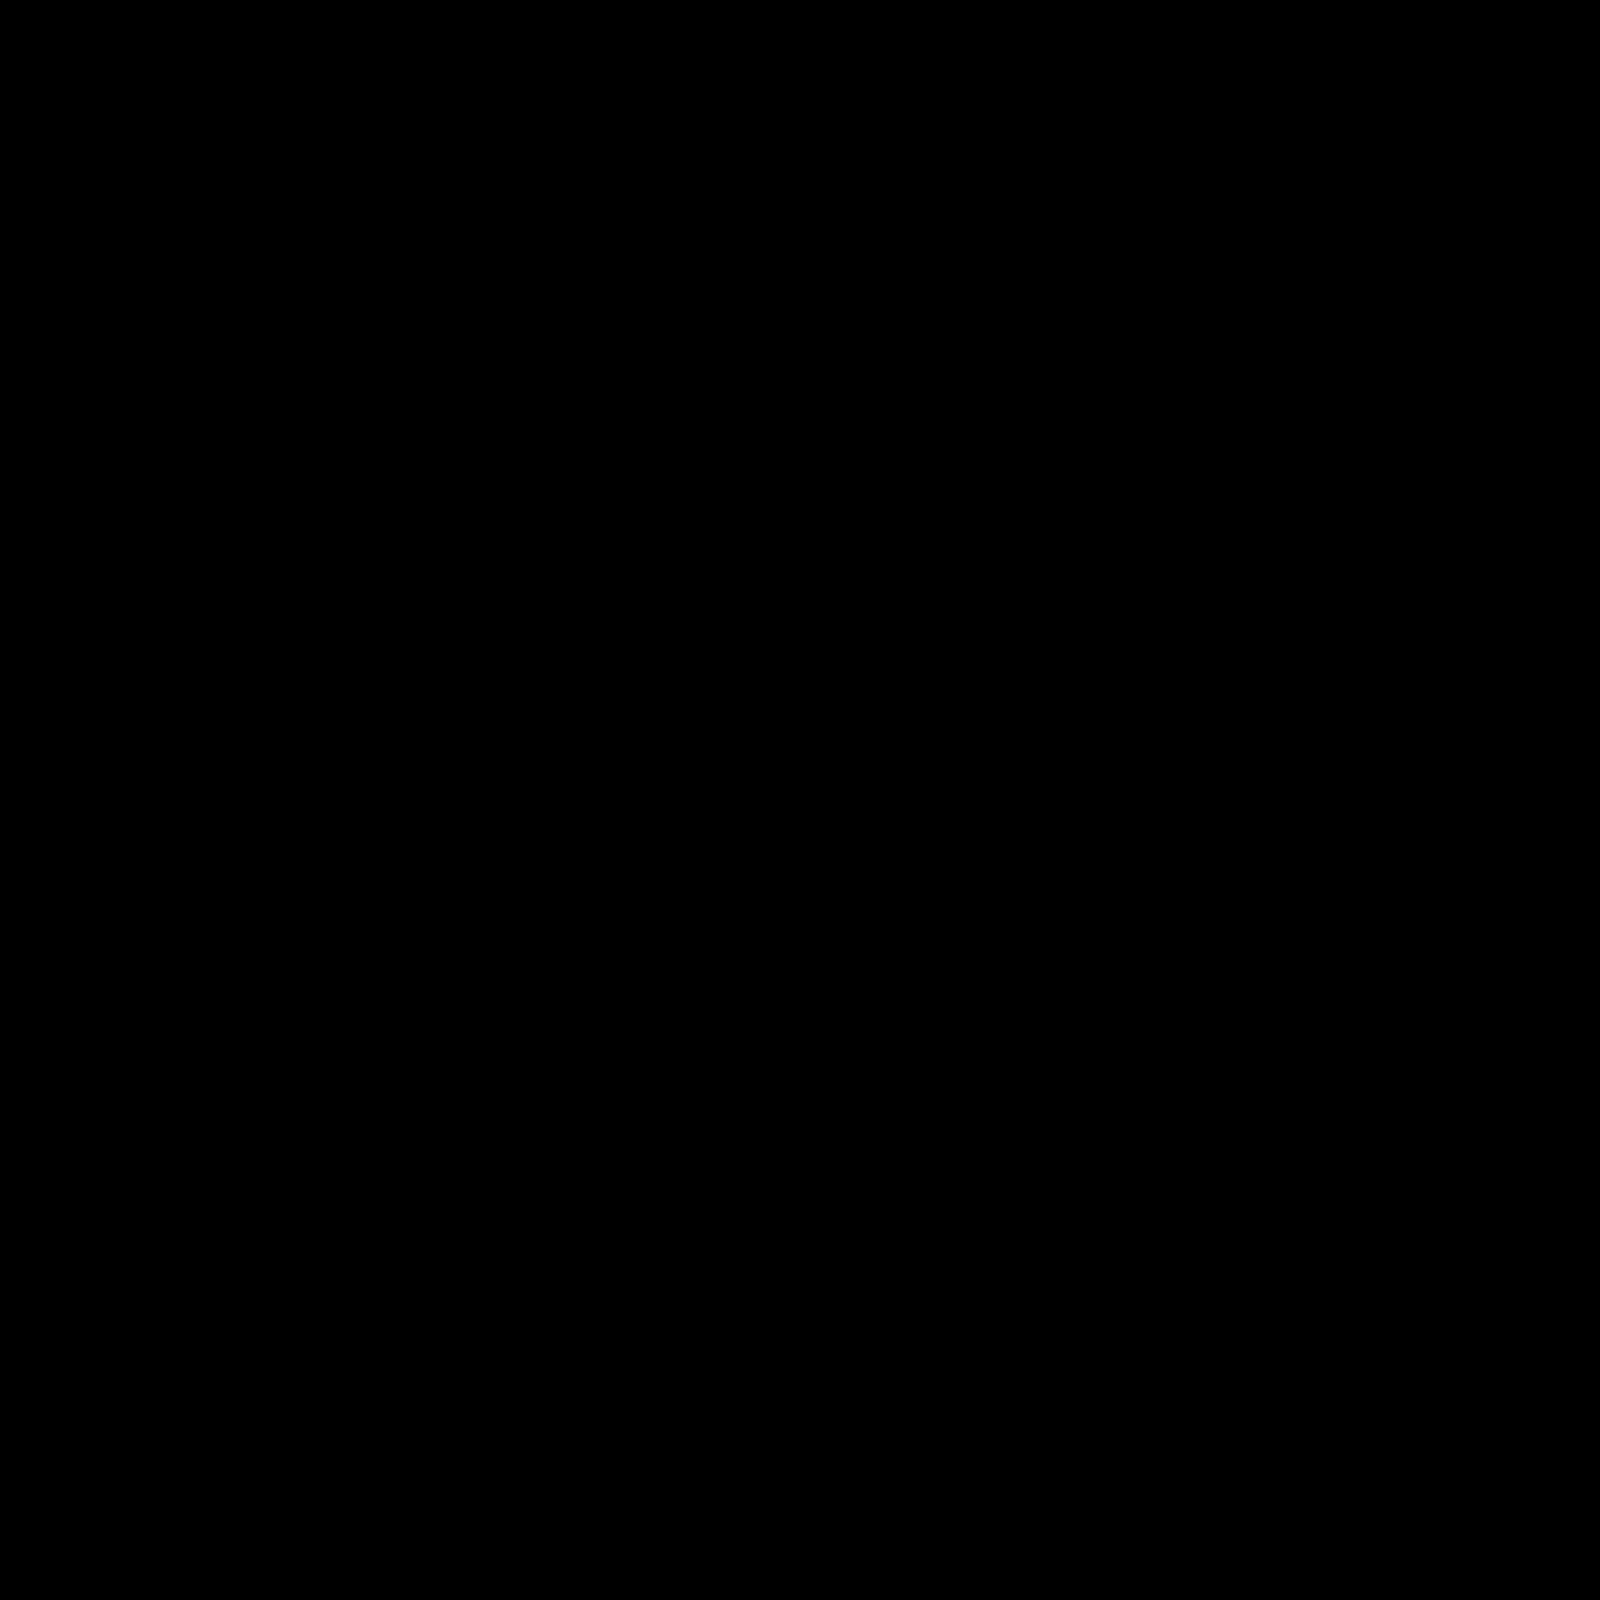 ABS 39692 Indicatore dusura